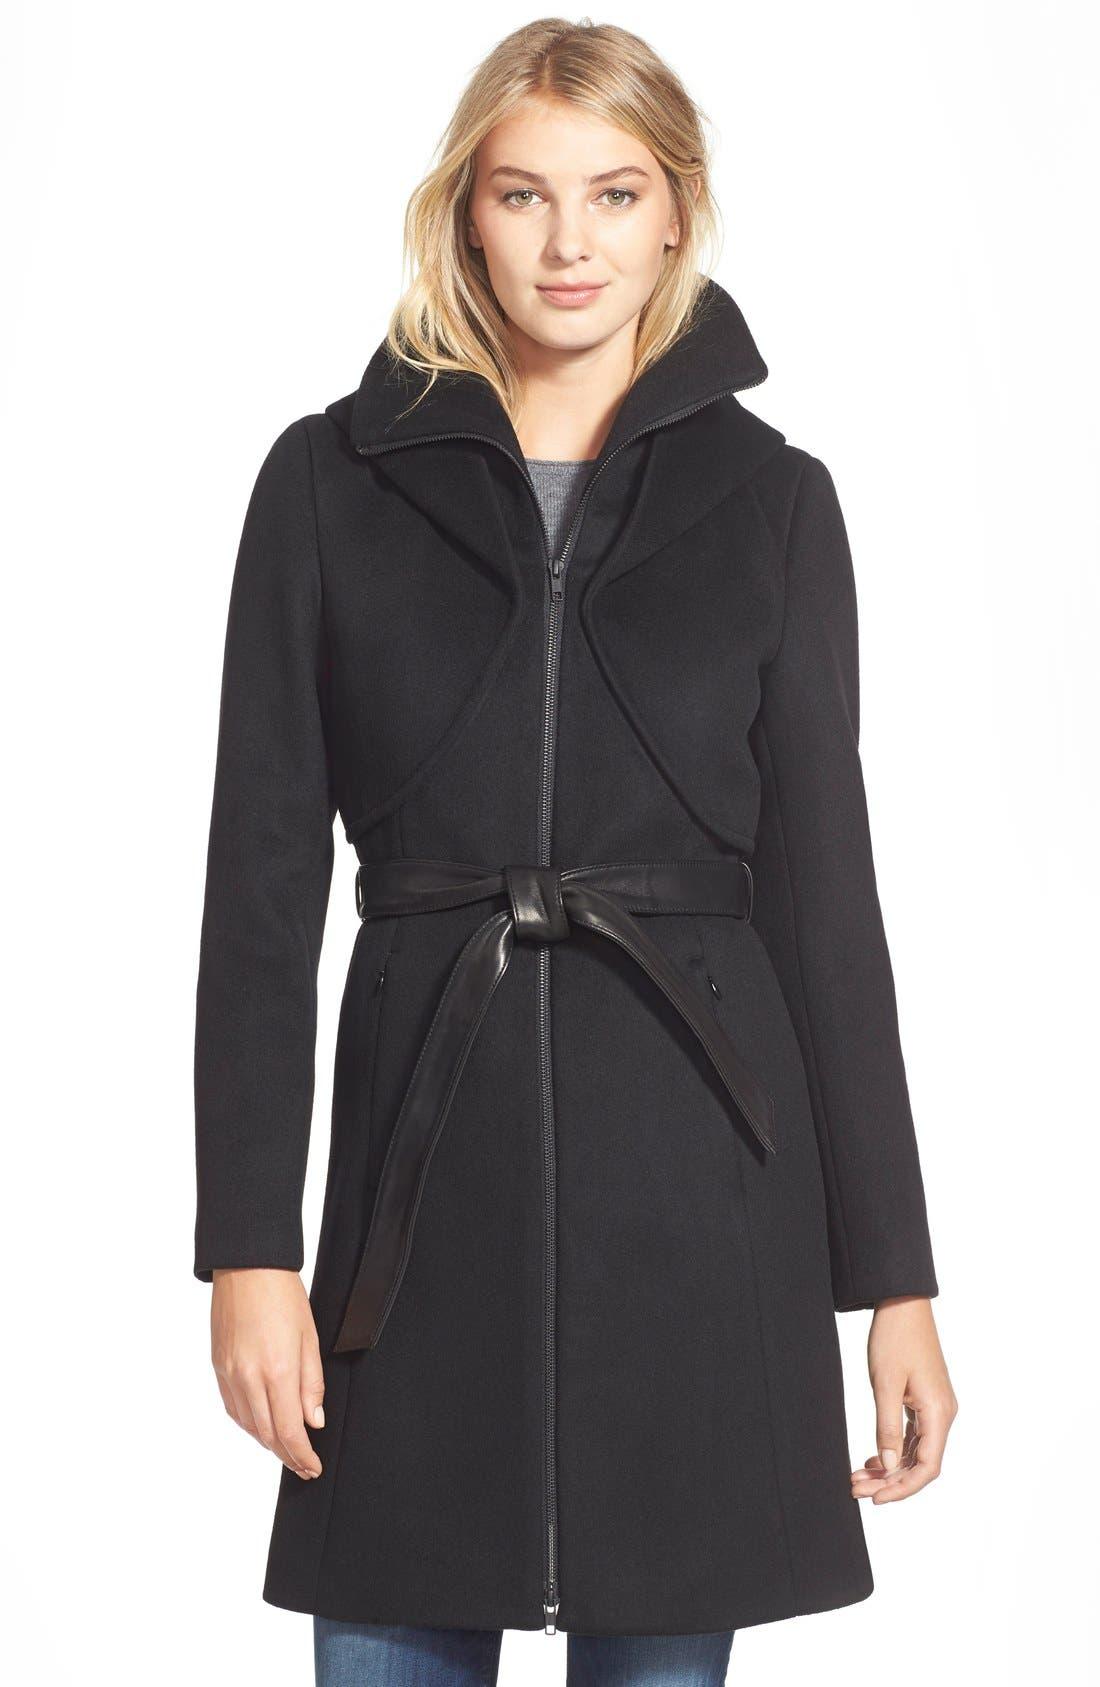 Main Image - Soia & Kyo 'Arya' Hooded Wool Blend Coat with Belt